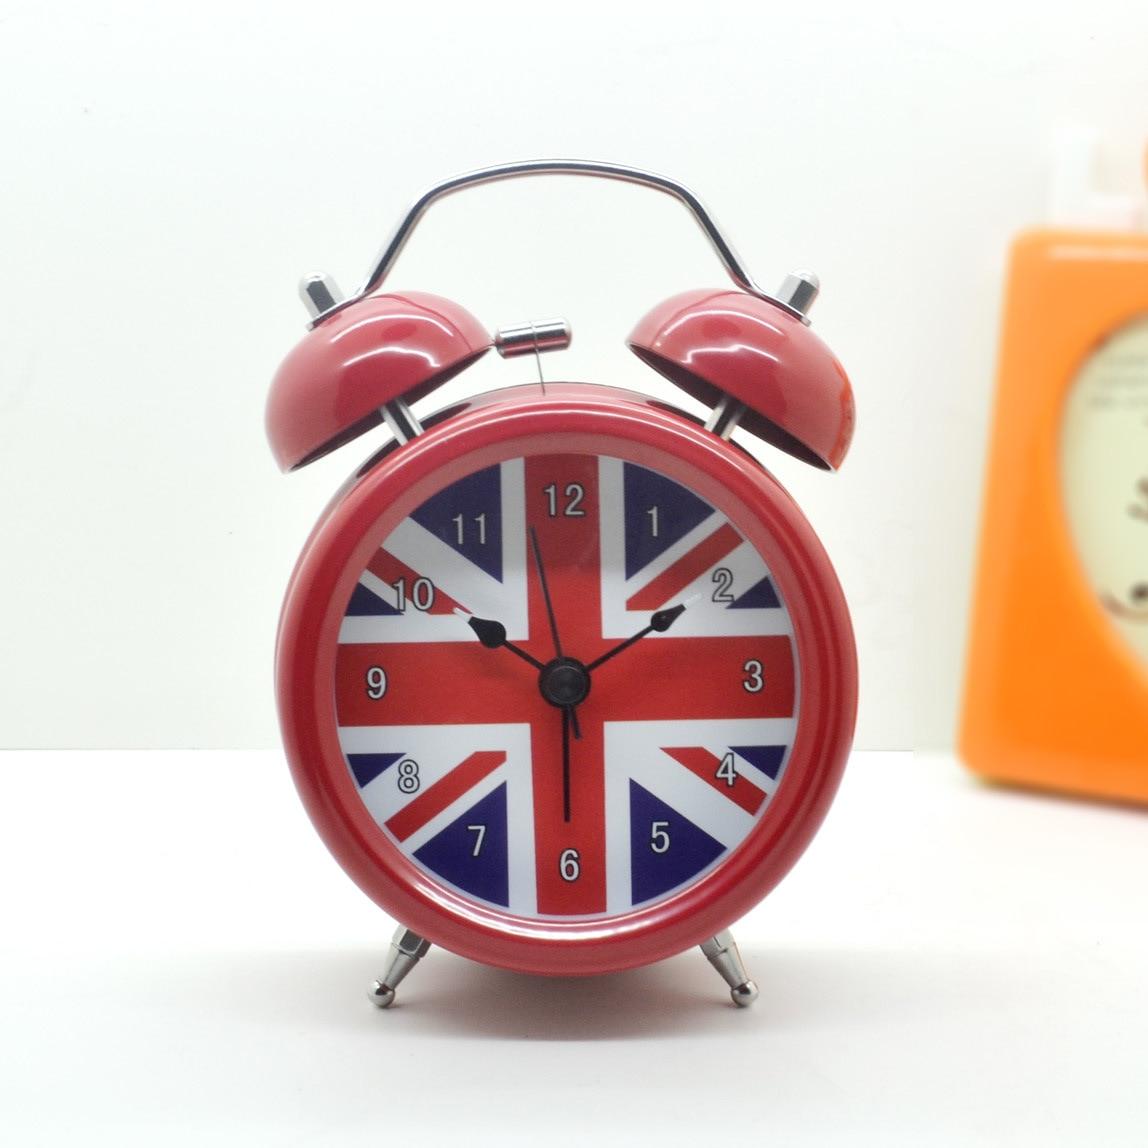 Alarm Clock Vintage Retro Silent Pointer Clocks Round Number Dual Bell Loud Alarm Clock Bedside Night Light Home Decors